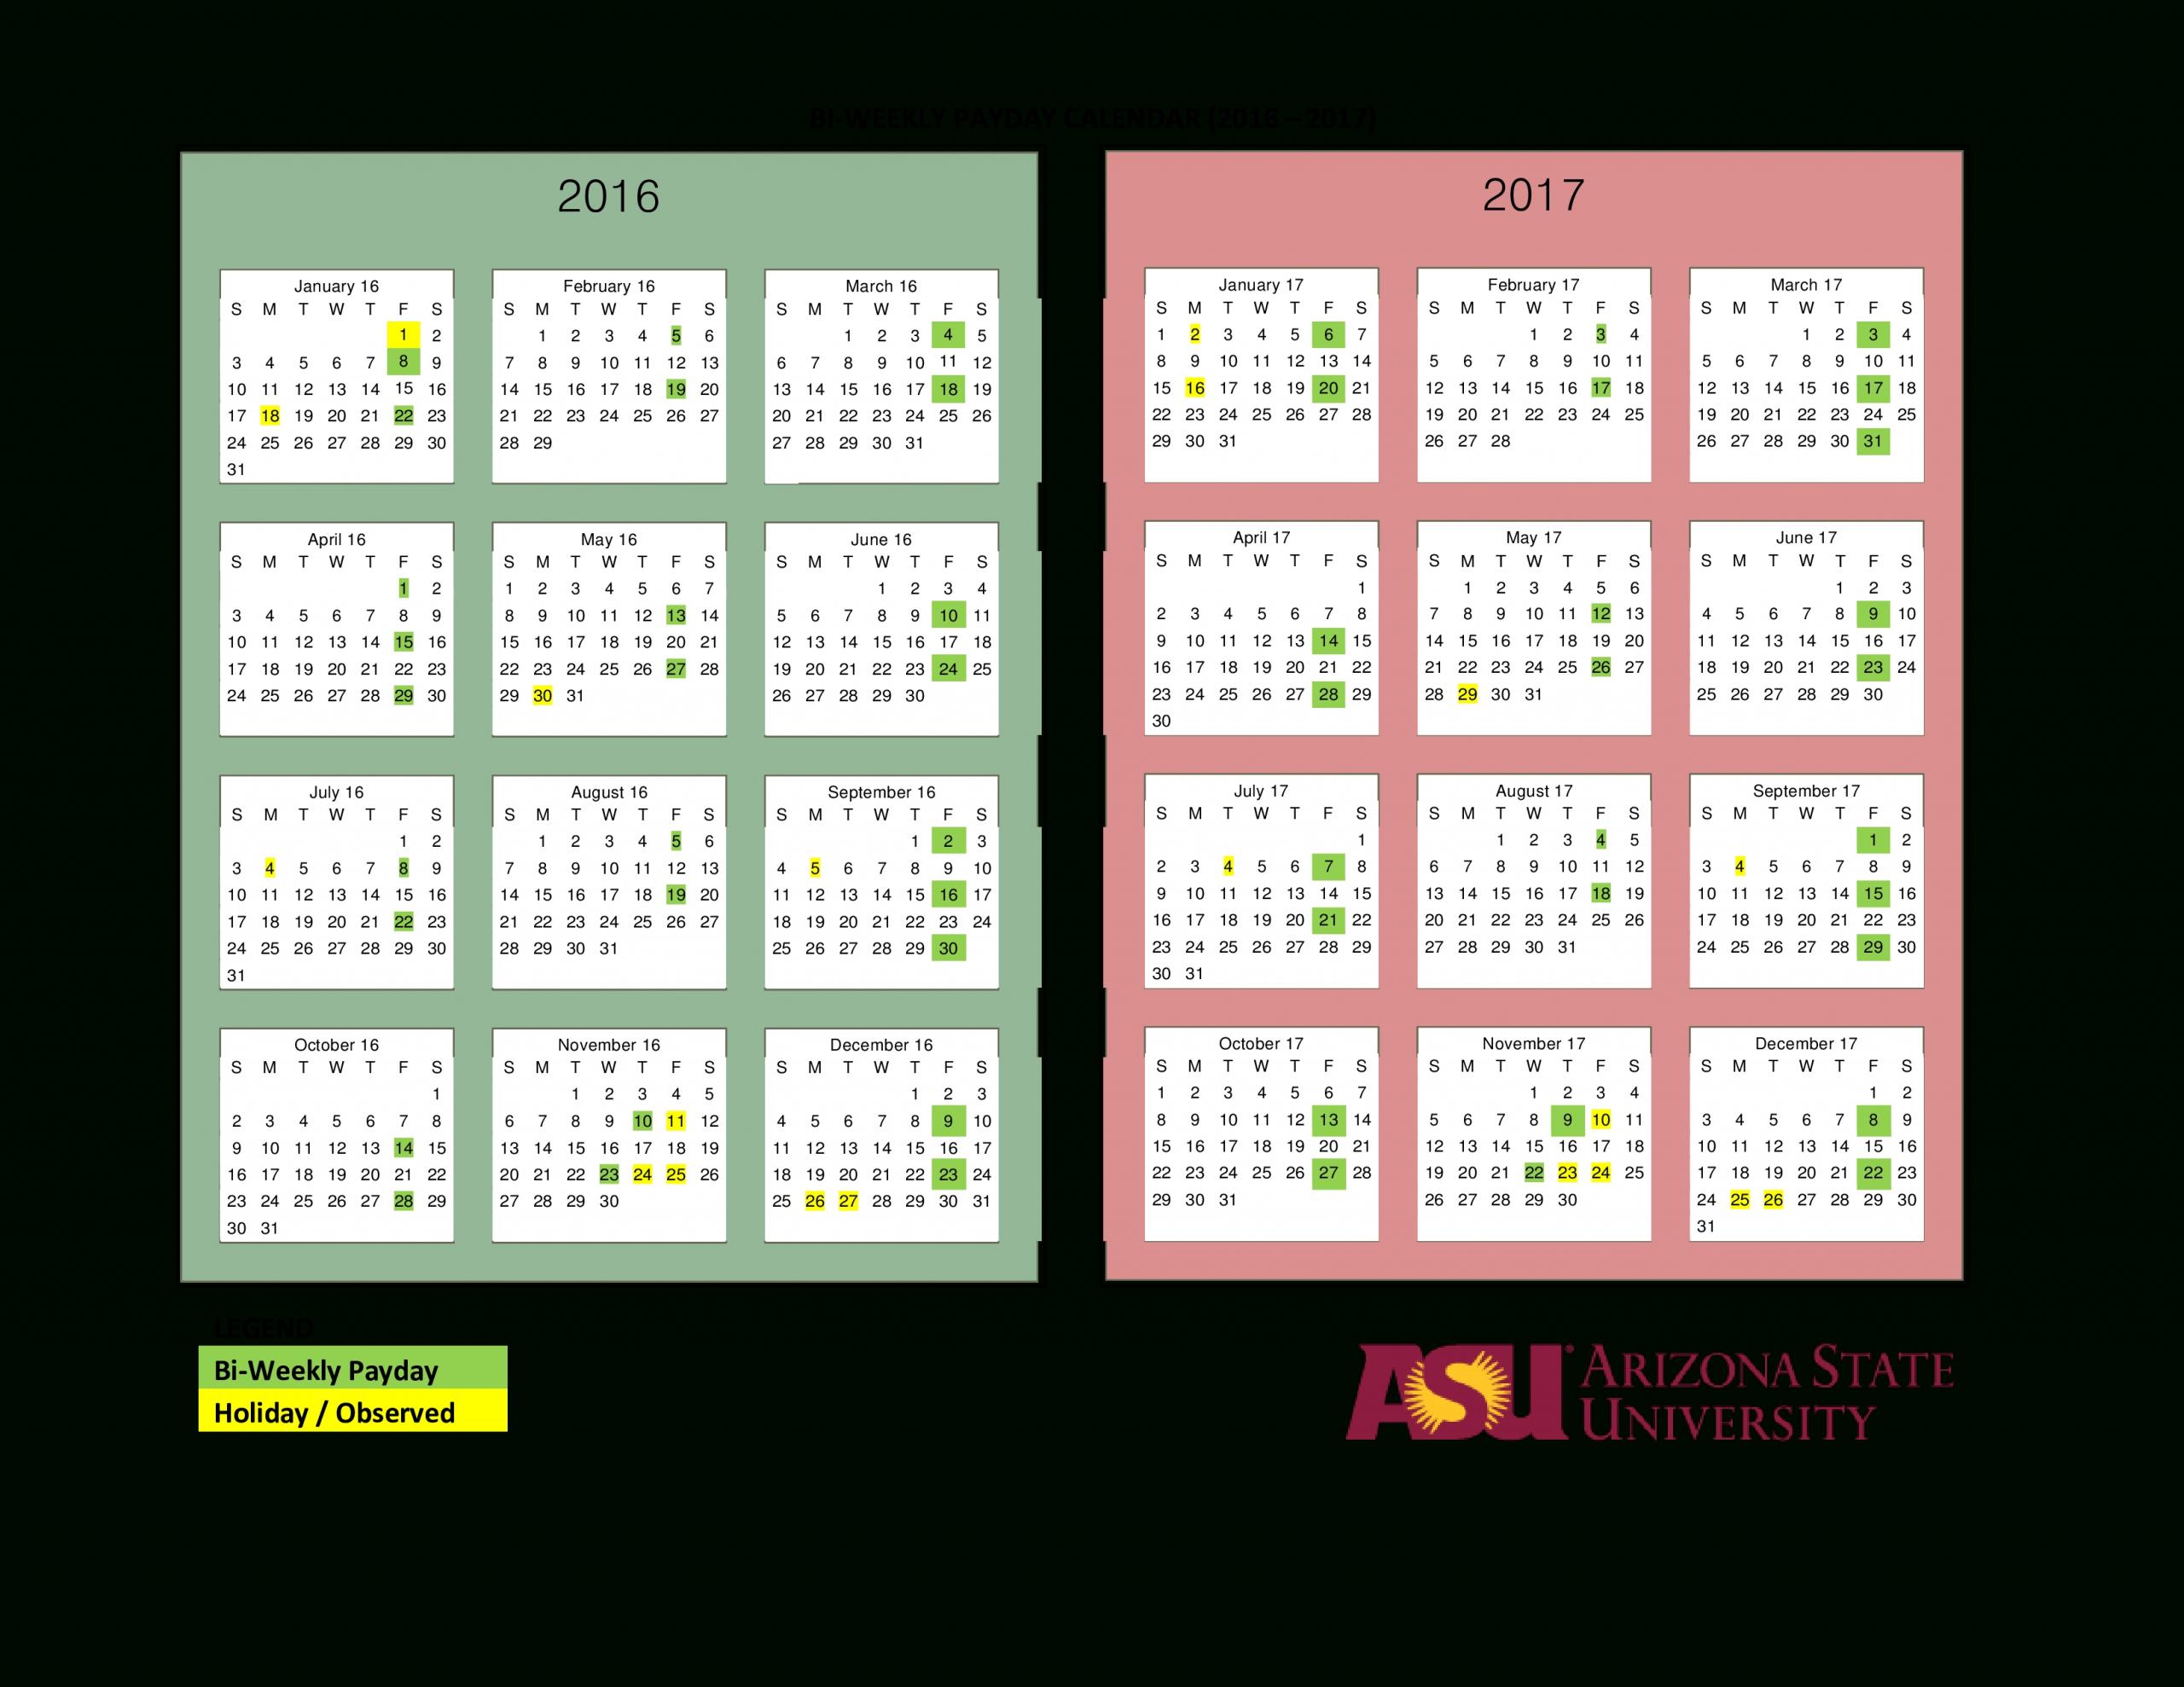 Printable Bi Weekly Payday Calendar Templates At